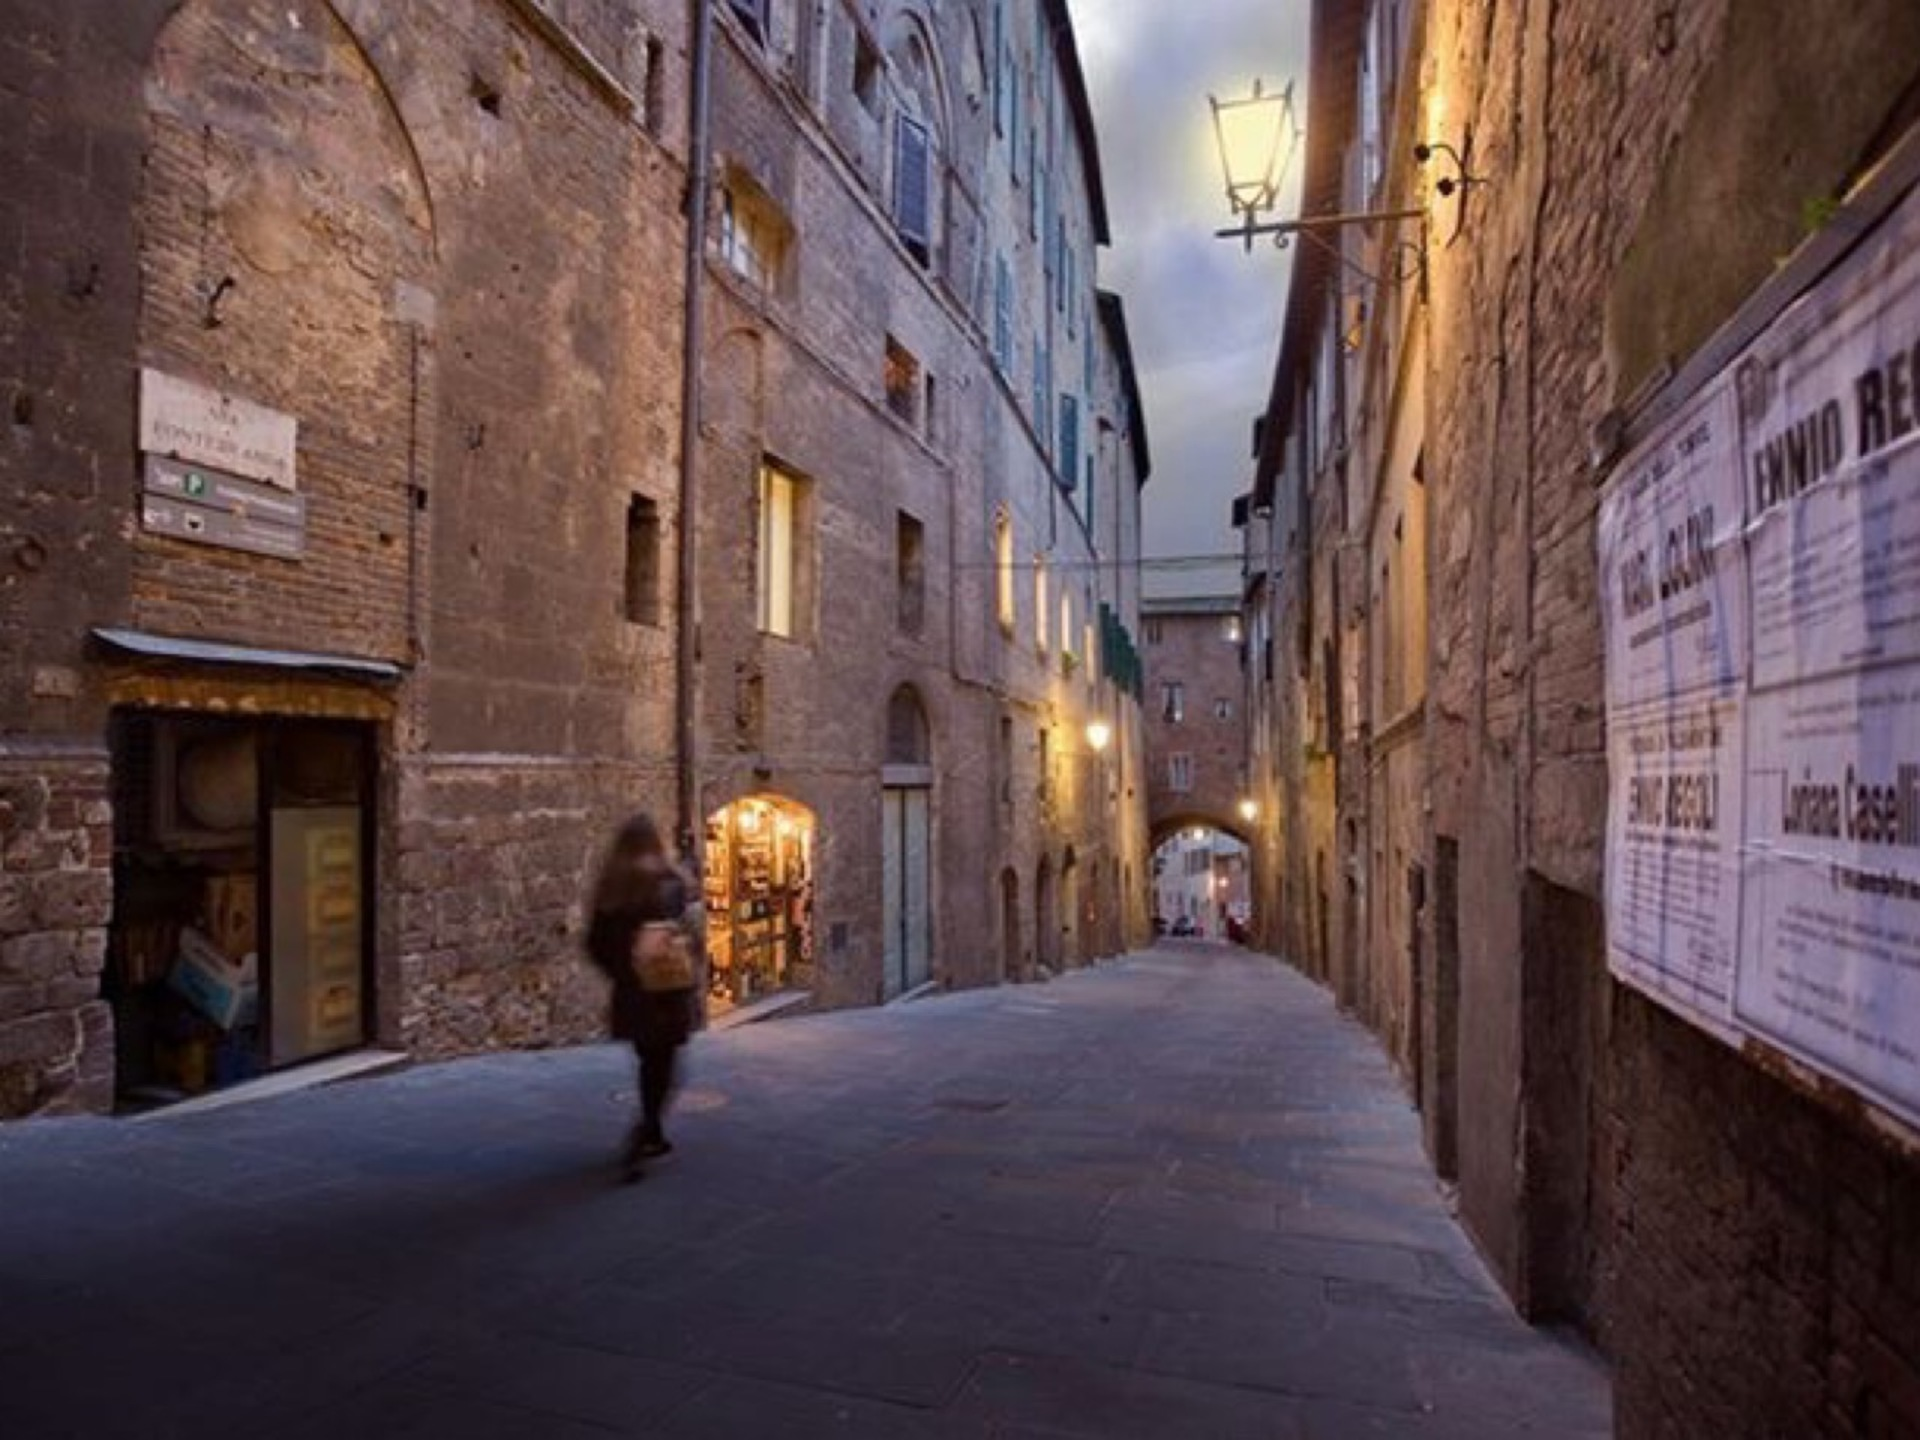 Siena side street | phogwood, alley, building, cobblestone